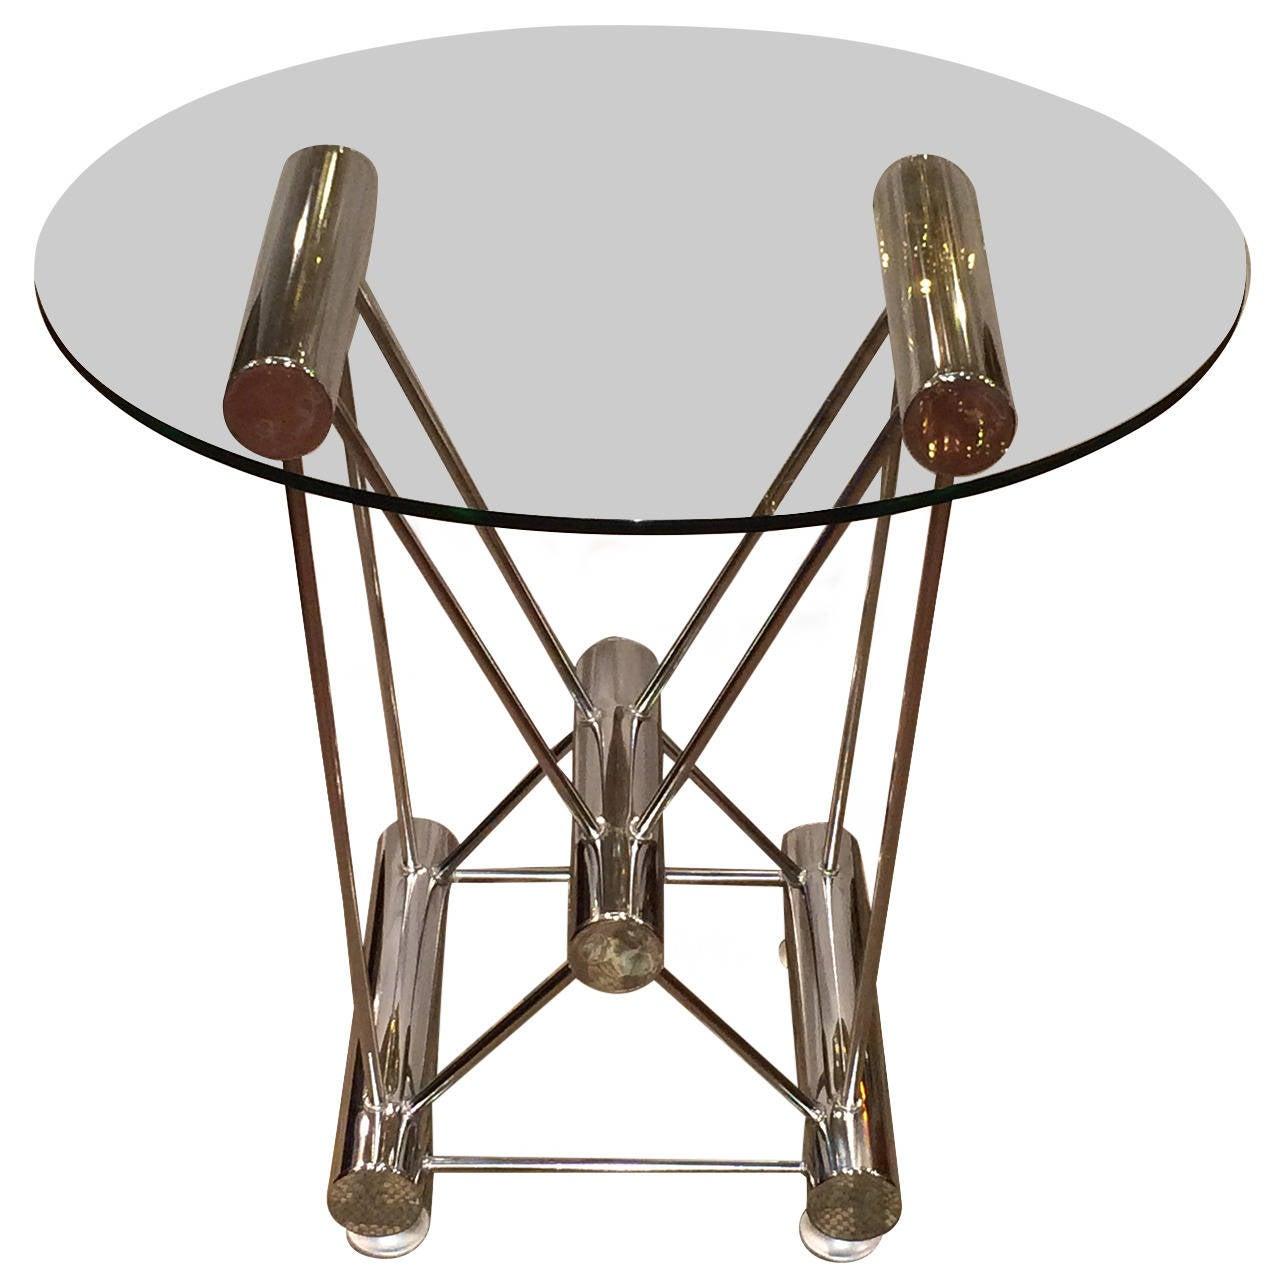 Sculptural Tubular Chrome and Glass Table